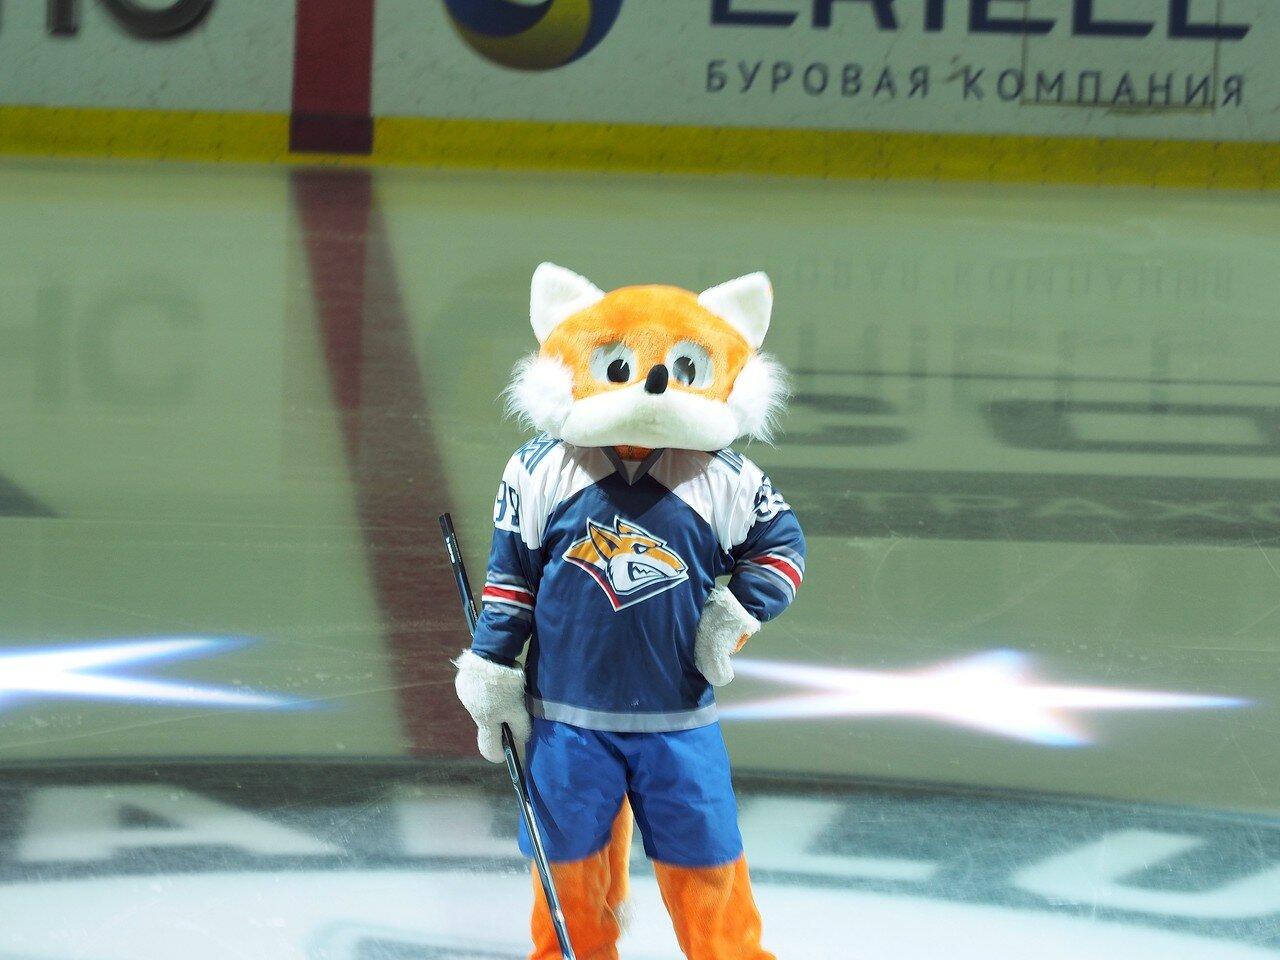 5Плей-офф 2016 Восток Финал Металлург - Салават Юлаев 25.03.2016